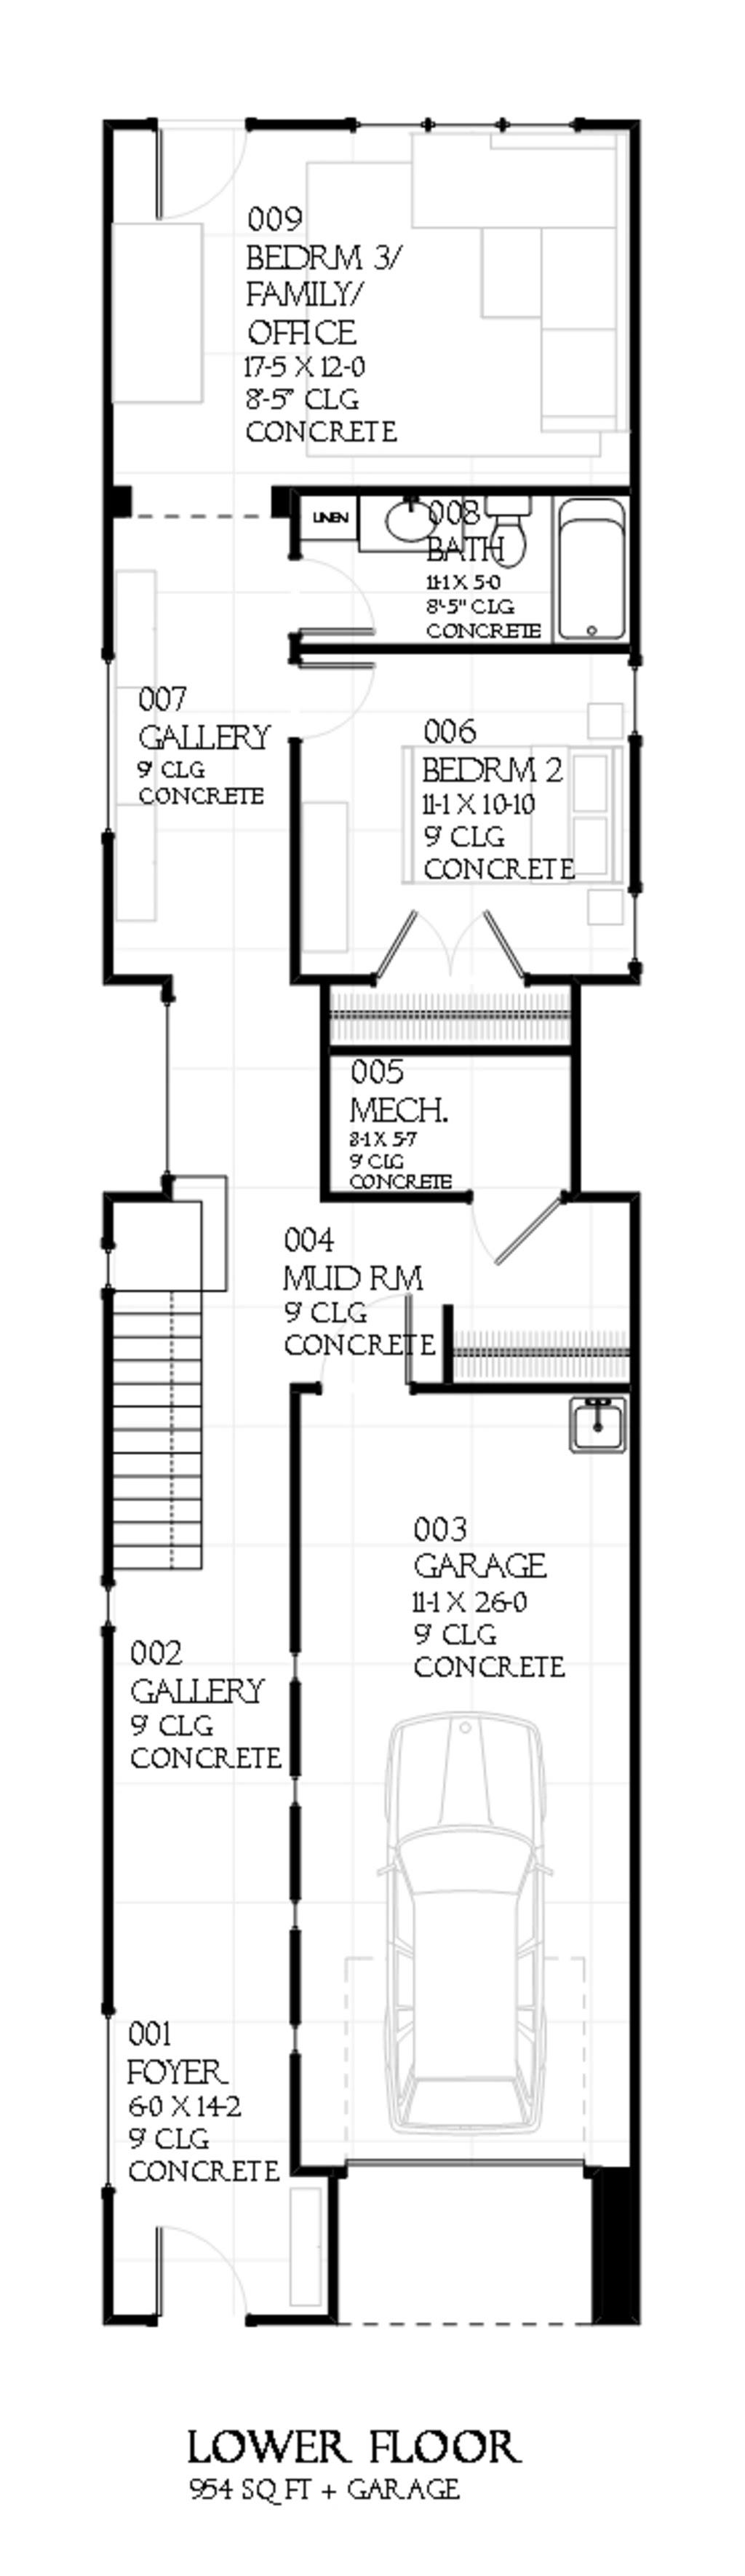 Narrow Home Plans - Home and Aplliances